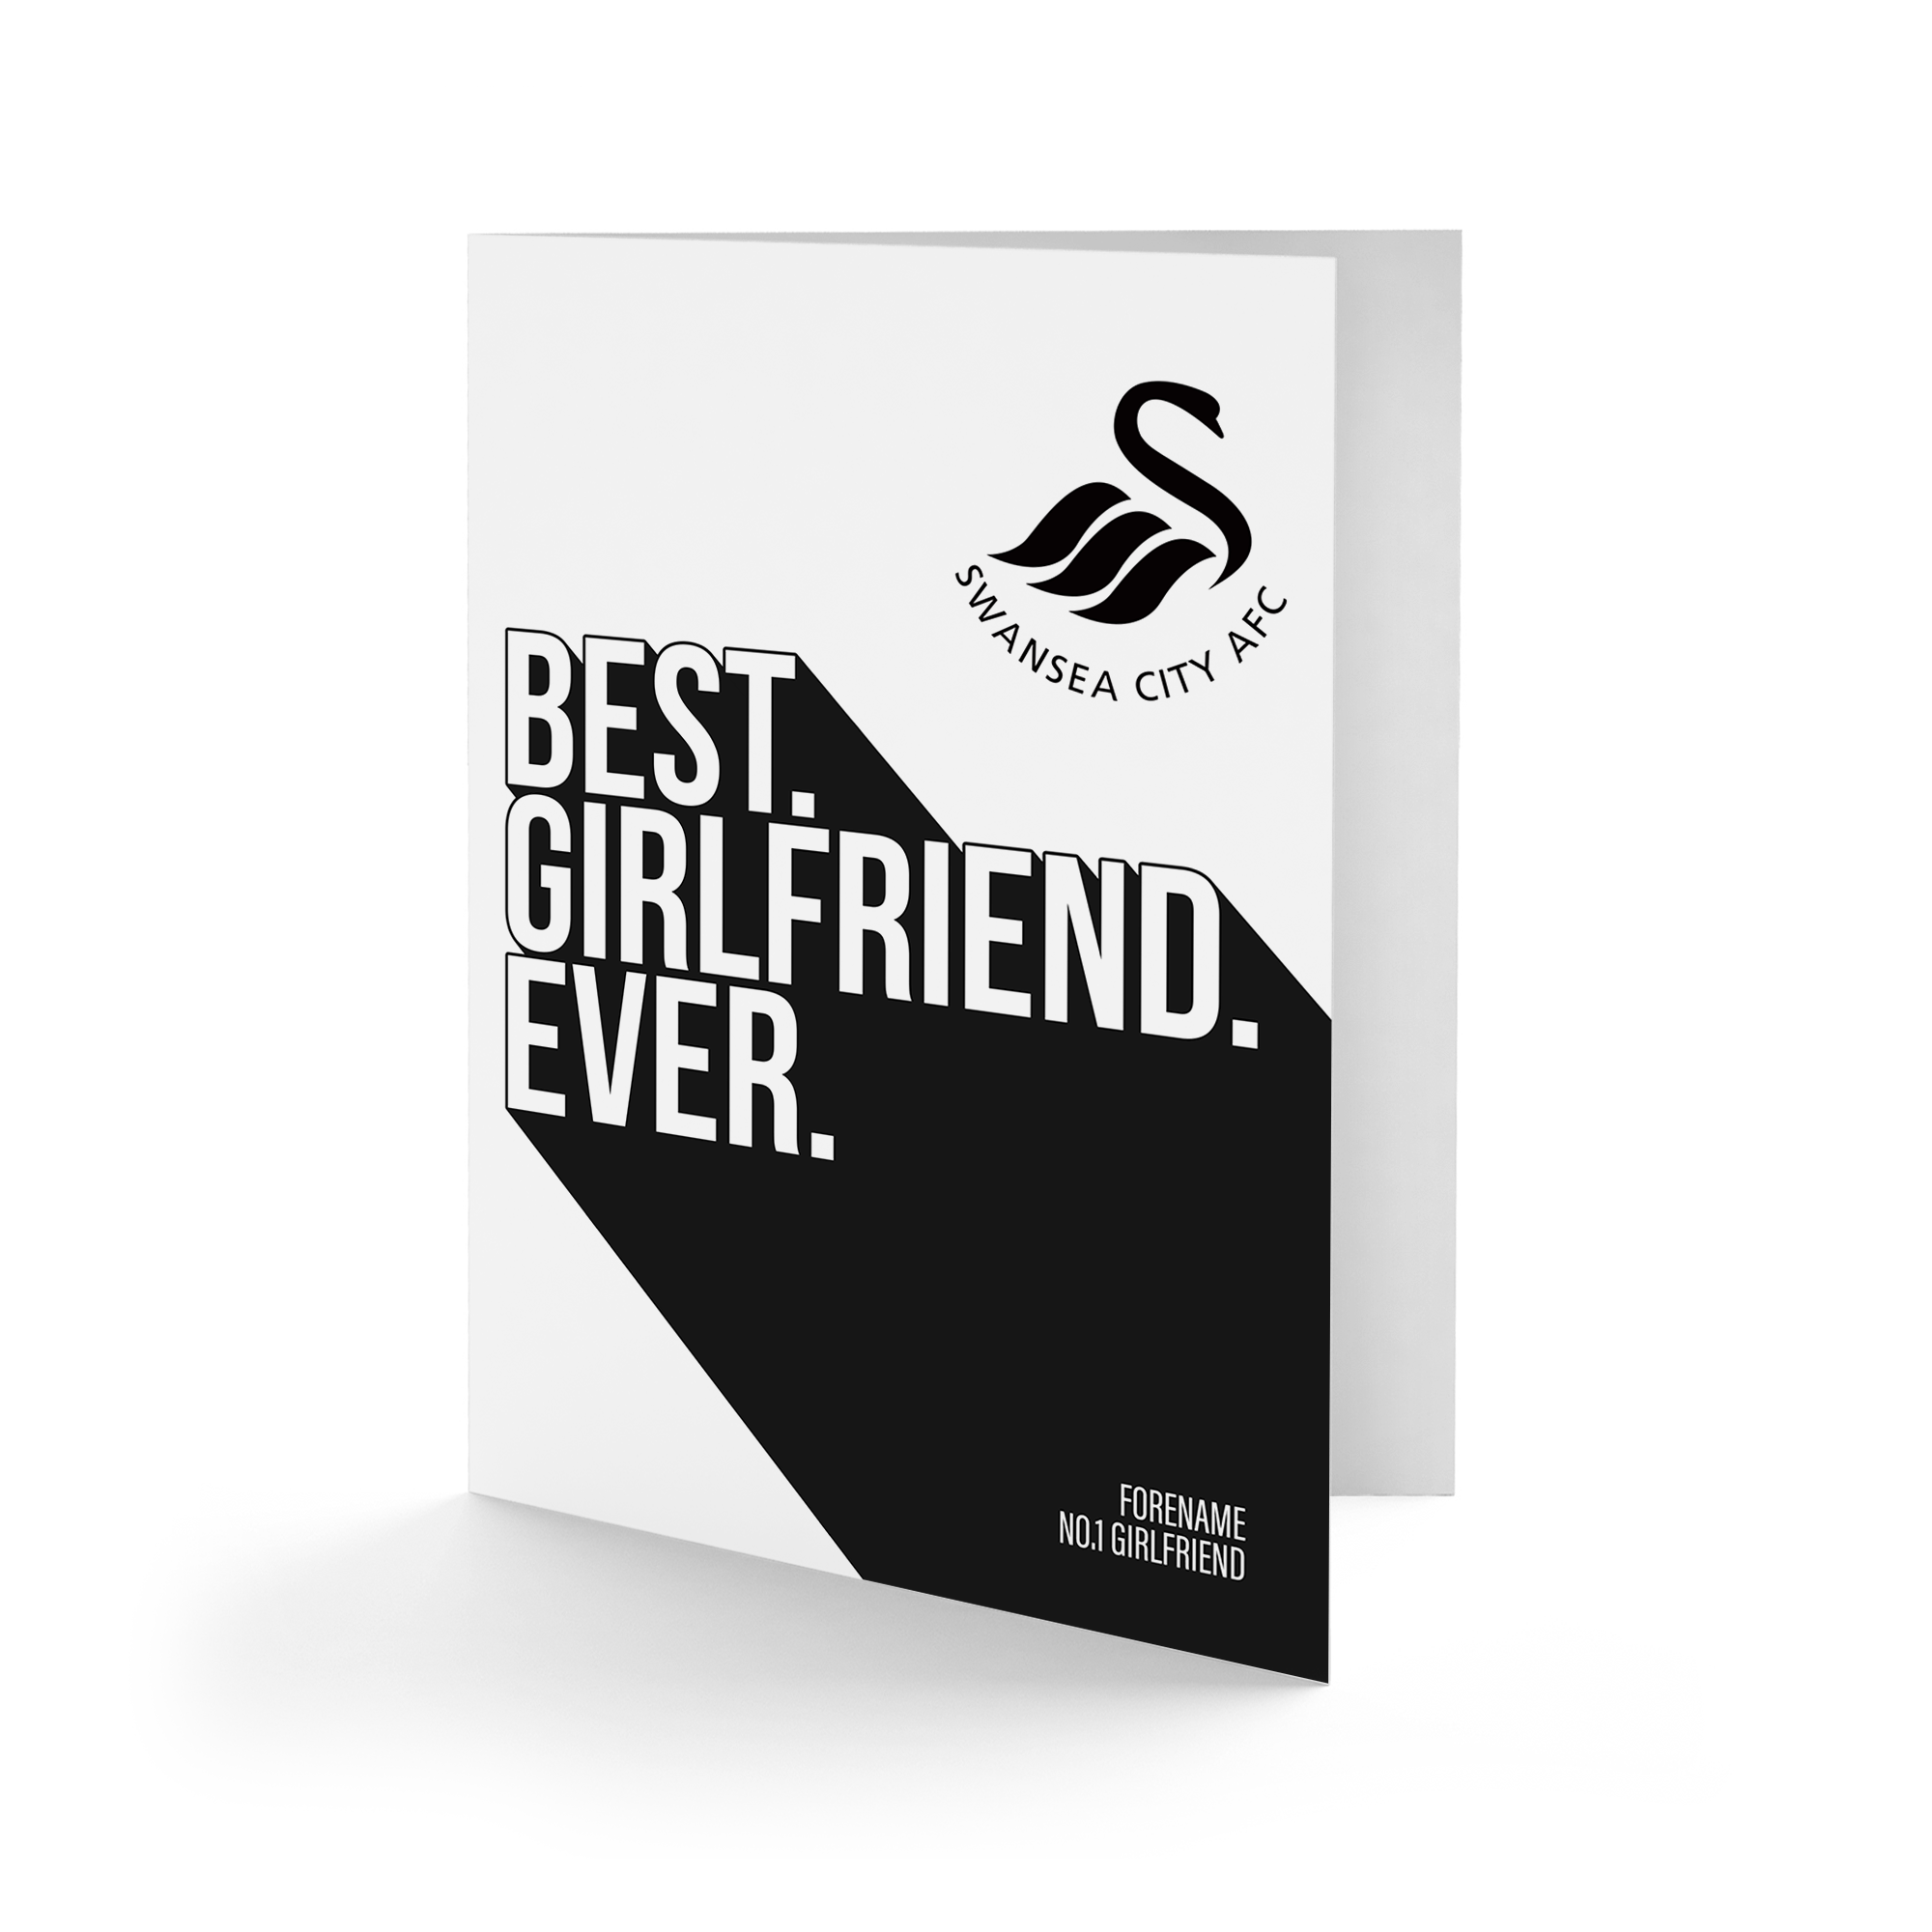 Swansea City AFC Best Girlfriend Ever Card